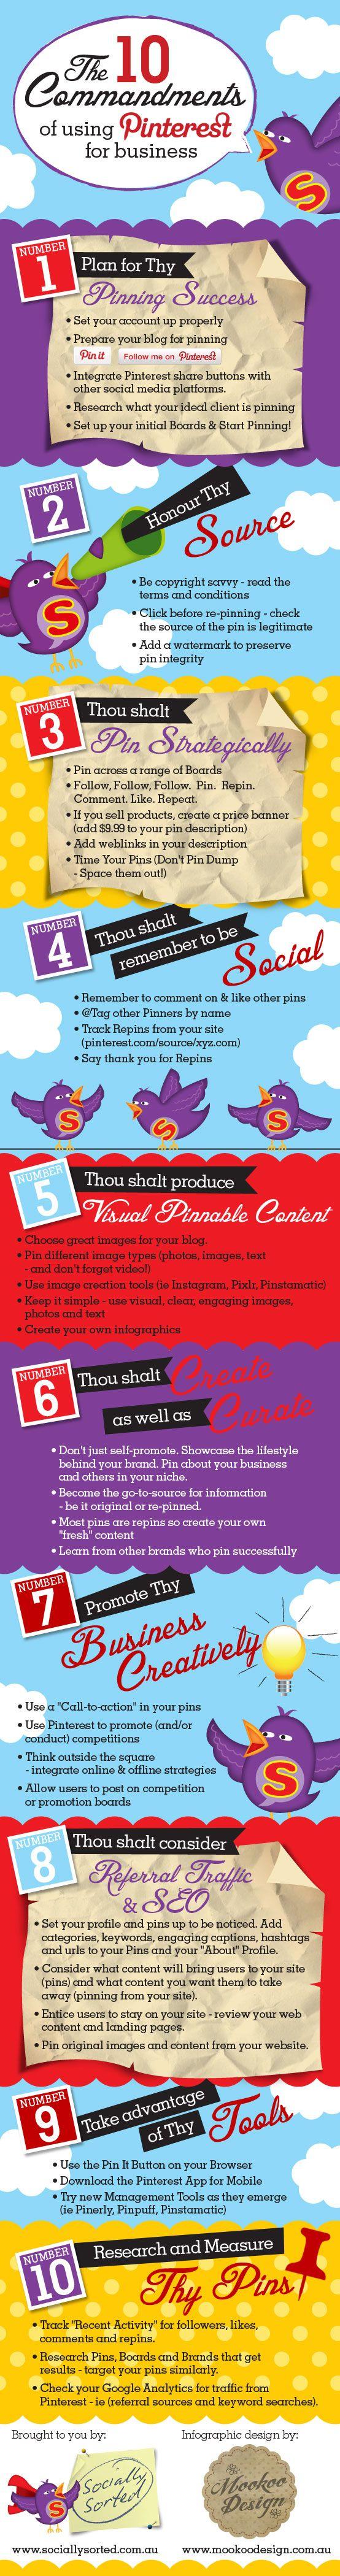 10 Commandments of Using Pinterest